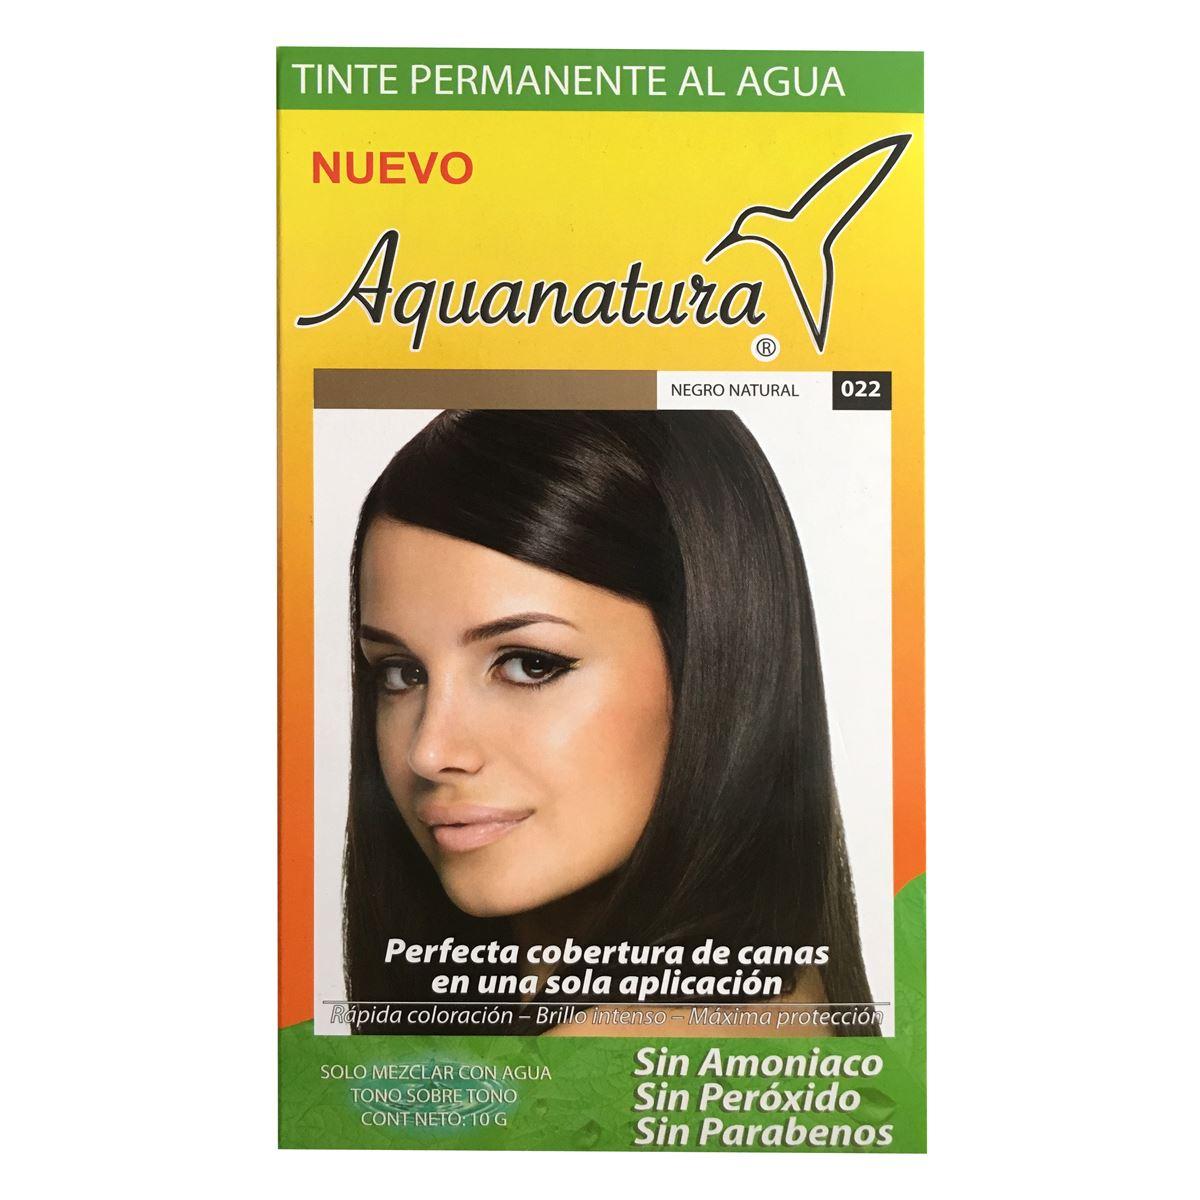 Tinte Permanente Al Agua Aquanatura Negro Natural